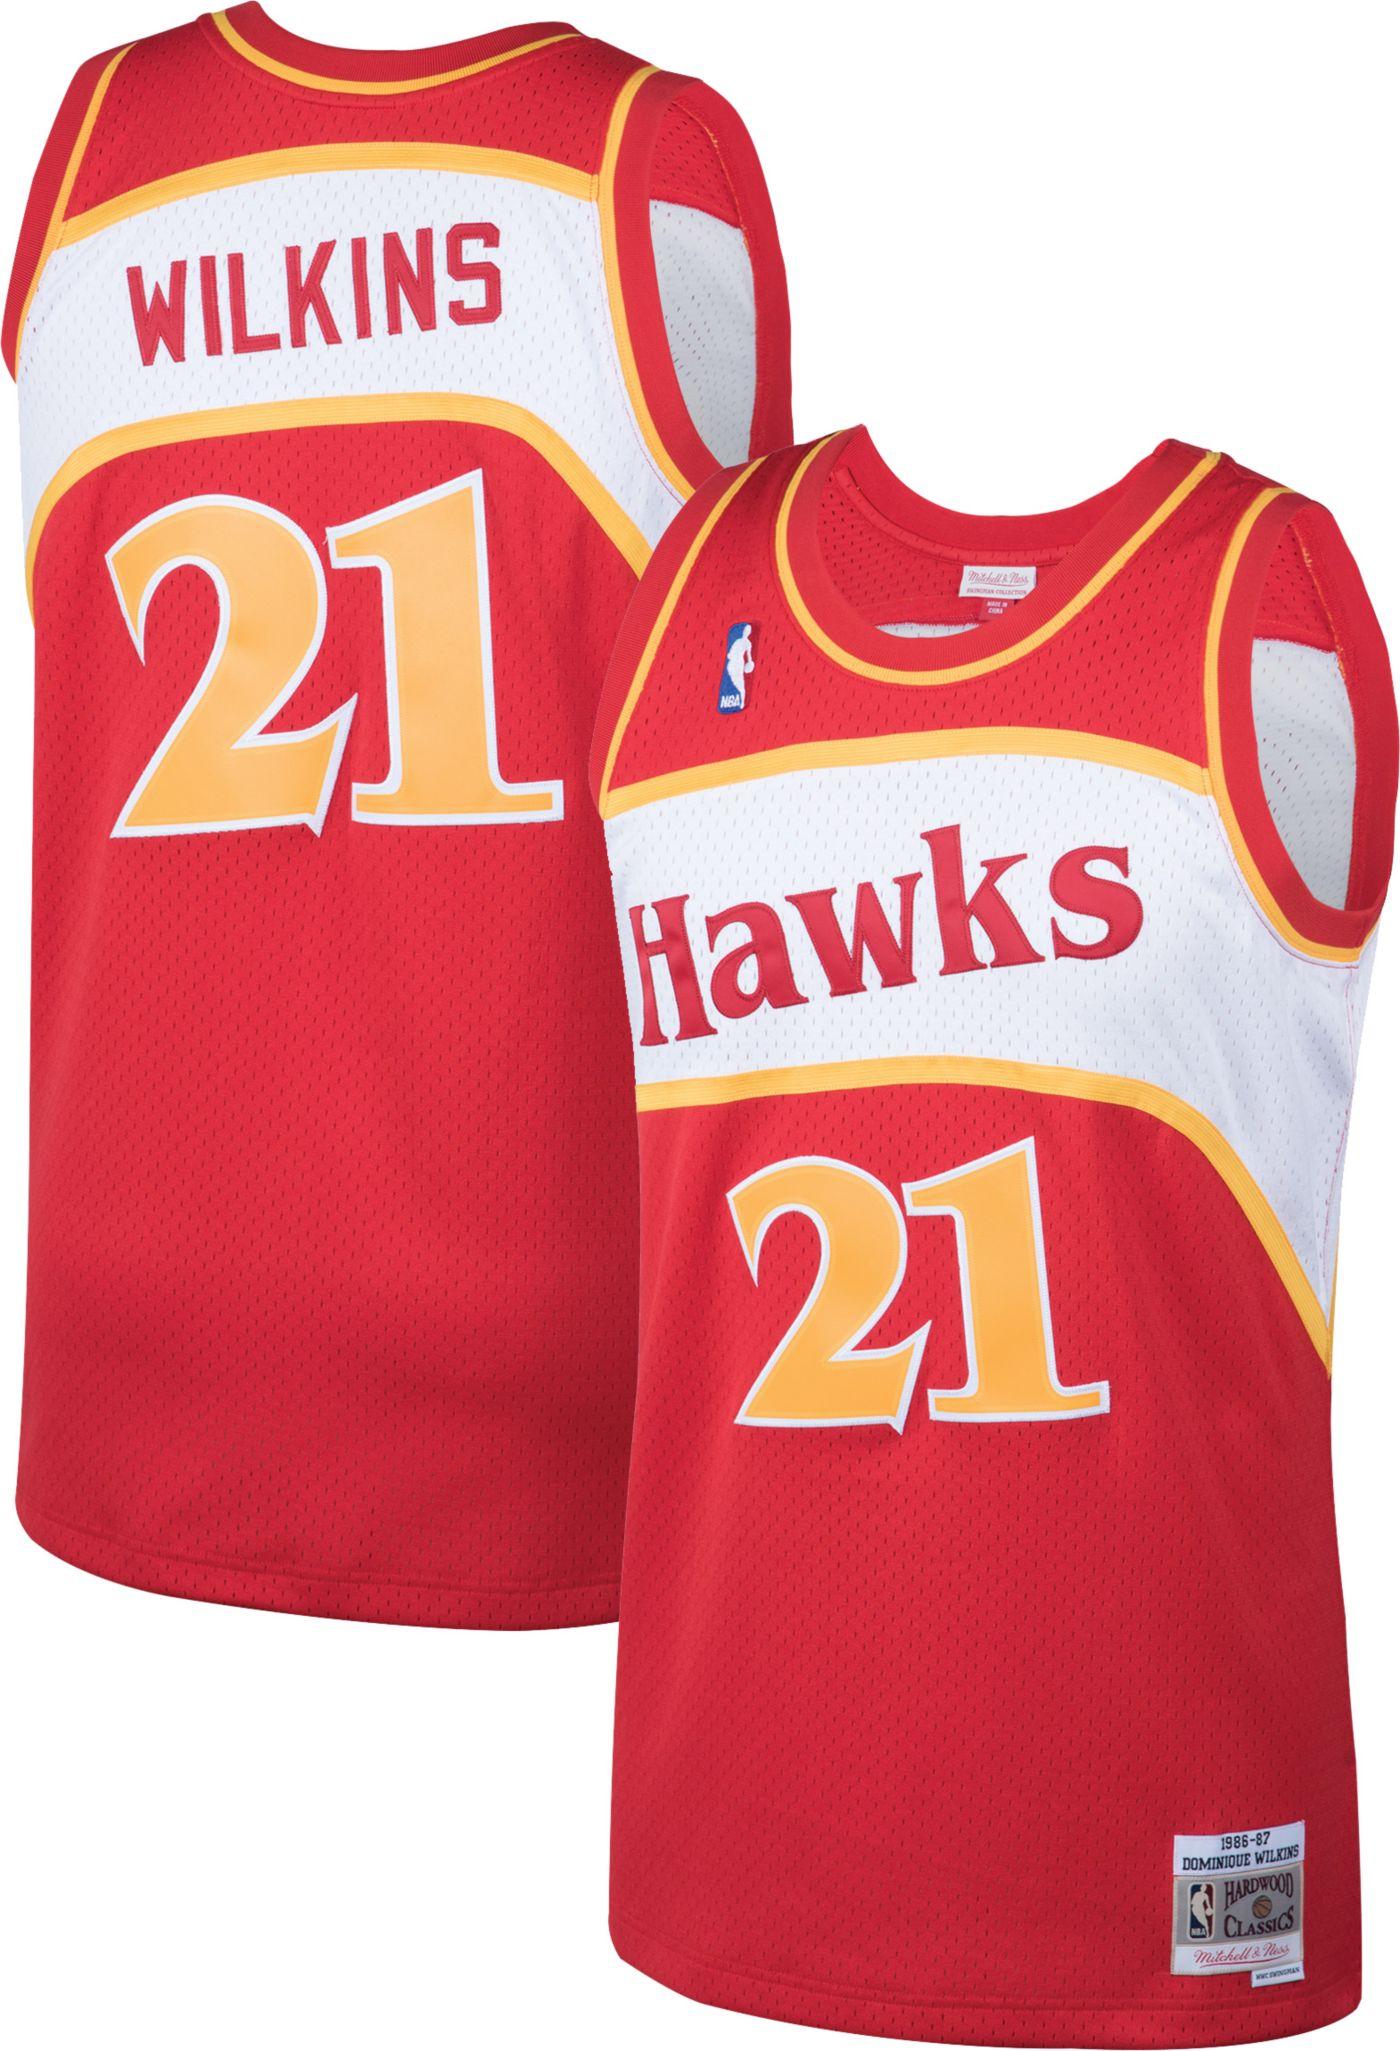 Mitchell & Ness Men's Atlanta Hawks Dominique Wilkins #21 Swingman Jersey